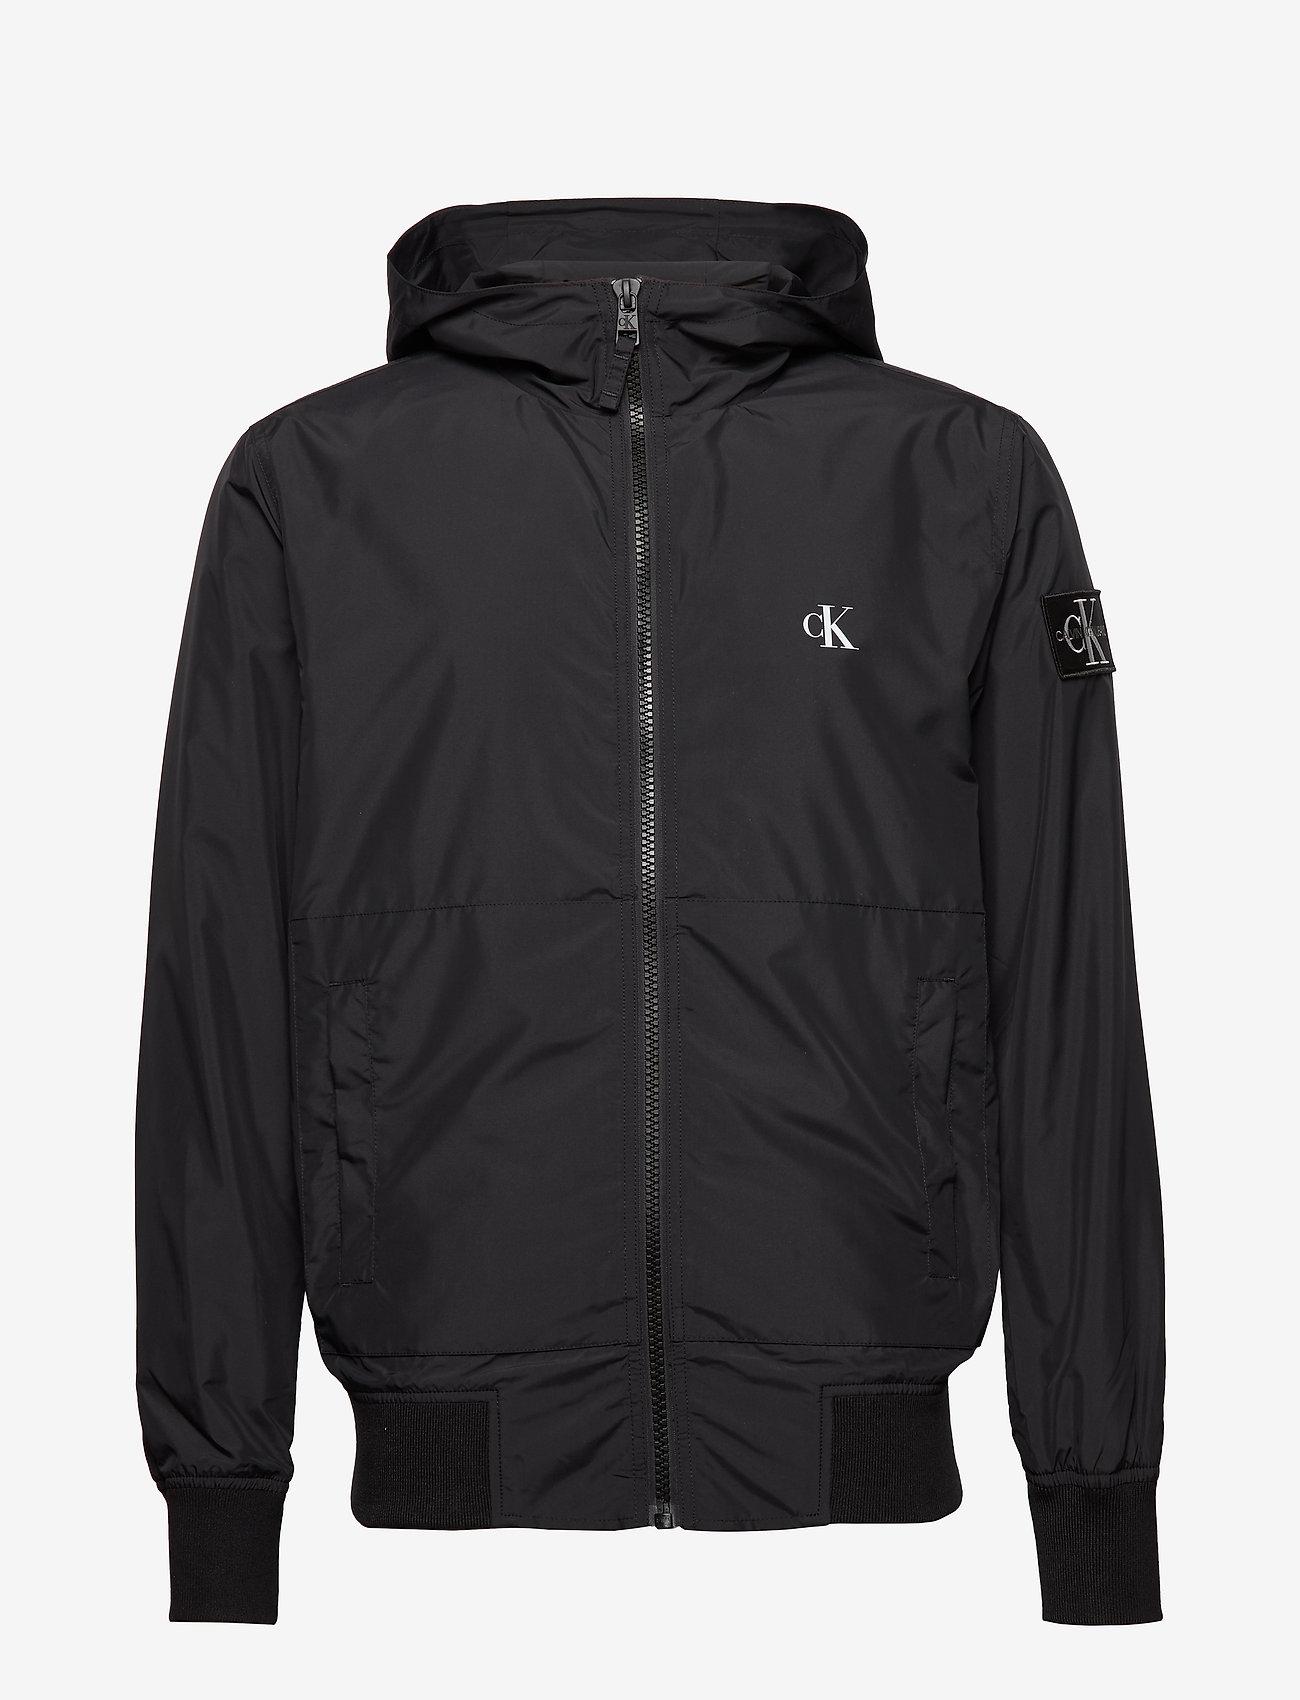 Calvin Klein Jeans - HOODED BLOCKING NYLON JACKET - light jackets - ck black/white - 1